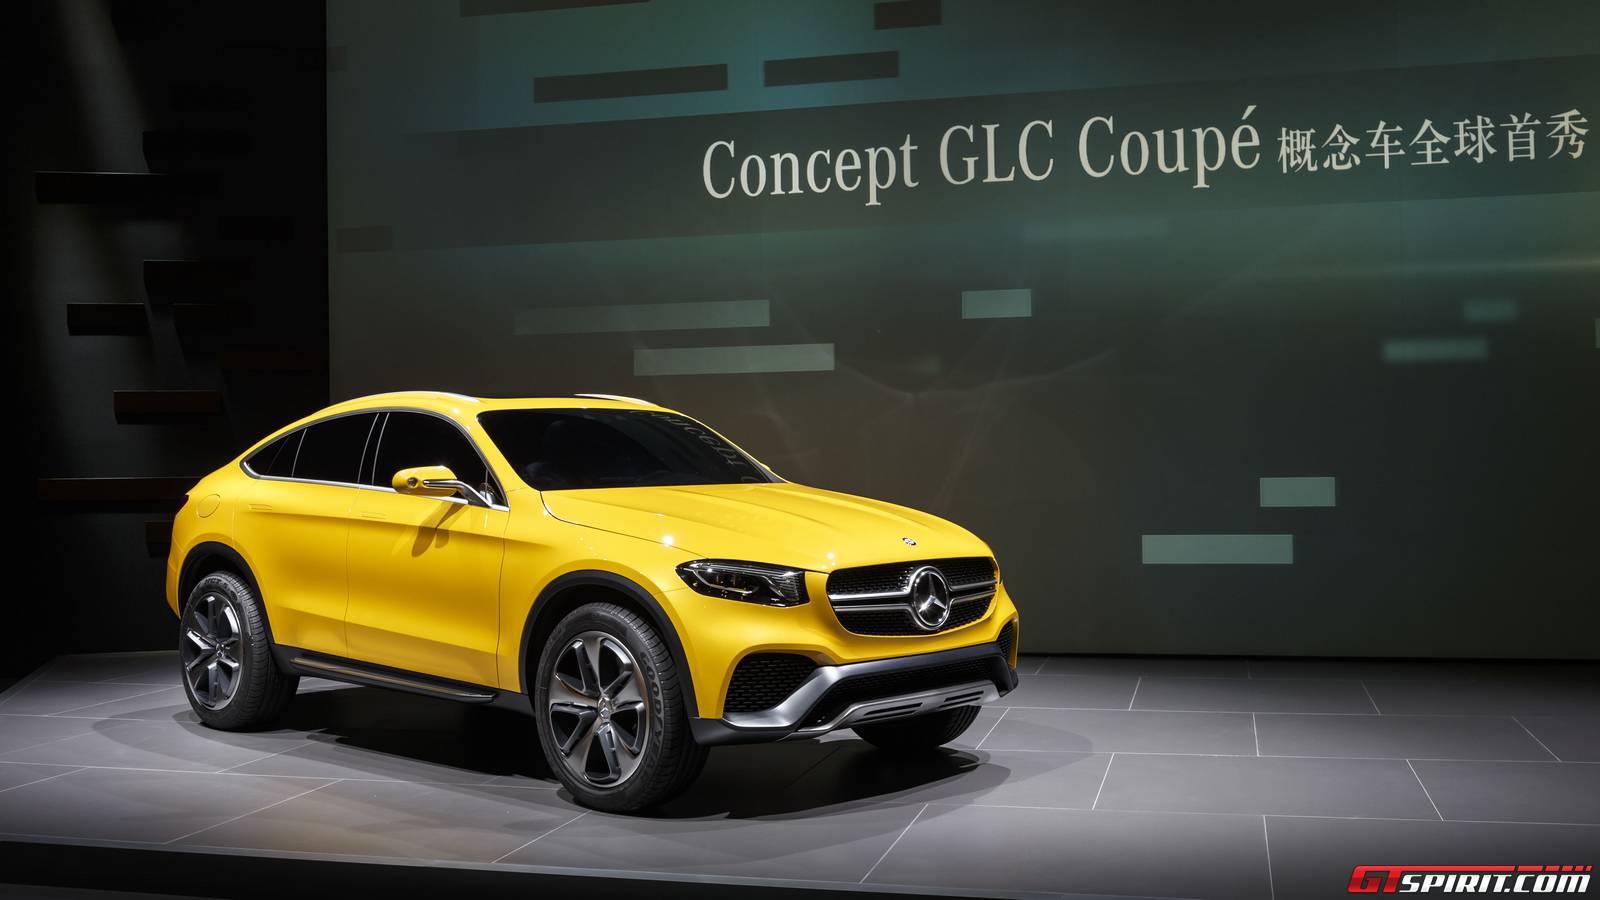 http://www.gtspirit.com/wp-content/gallery/mercedes-benz-concept-glc-coupe-live/mercedes-benz-concept-glc-coupe-6.jpg